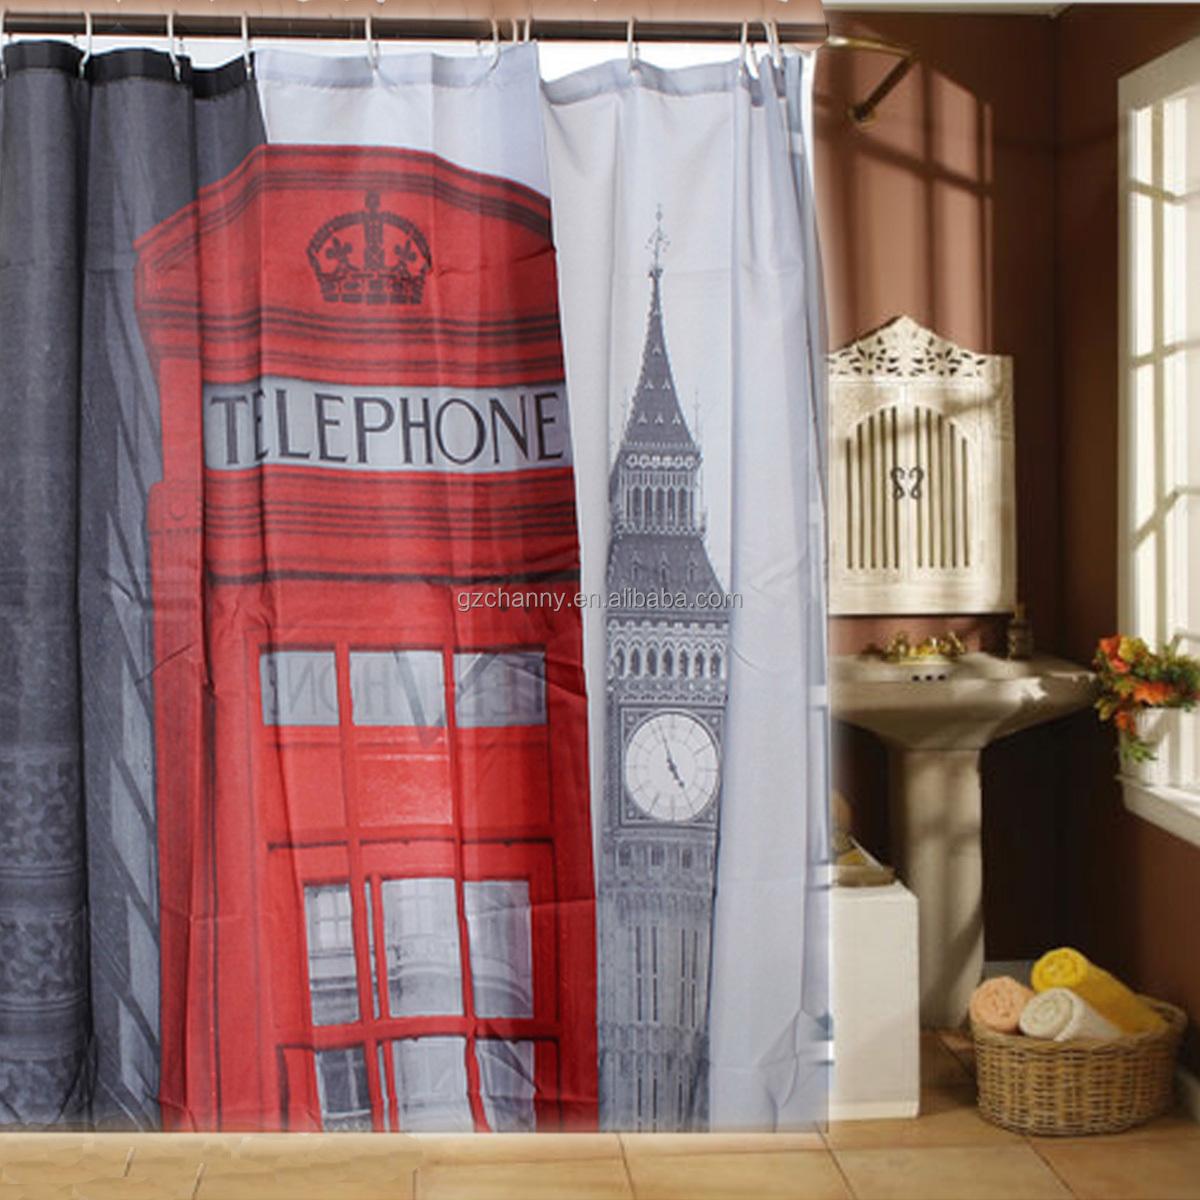 wholesale diy home decor london big ben telephone booth